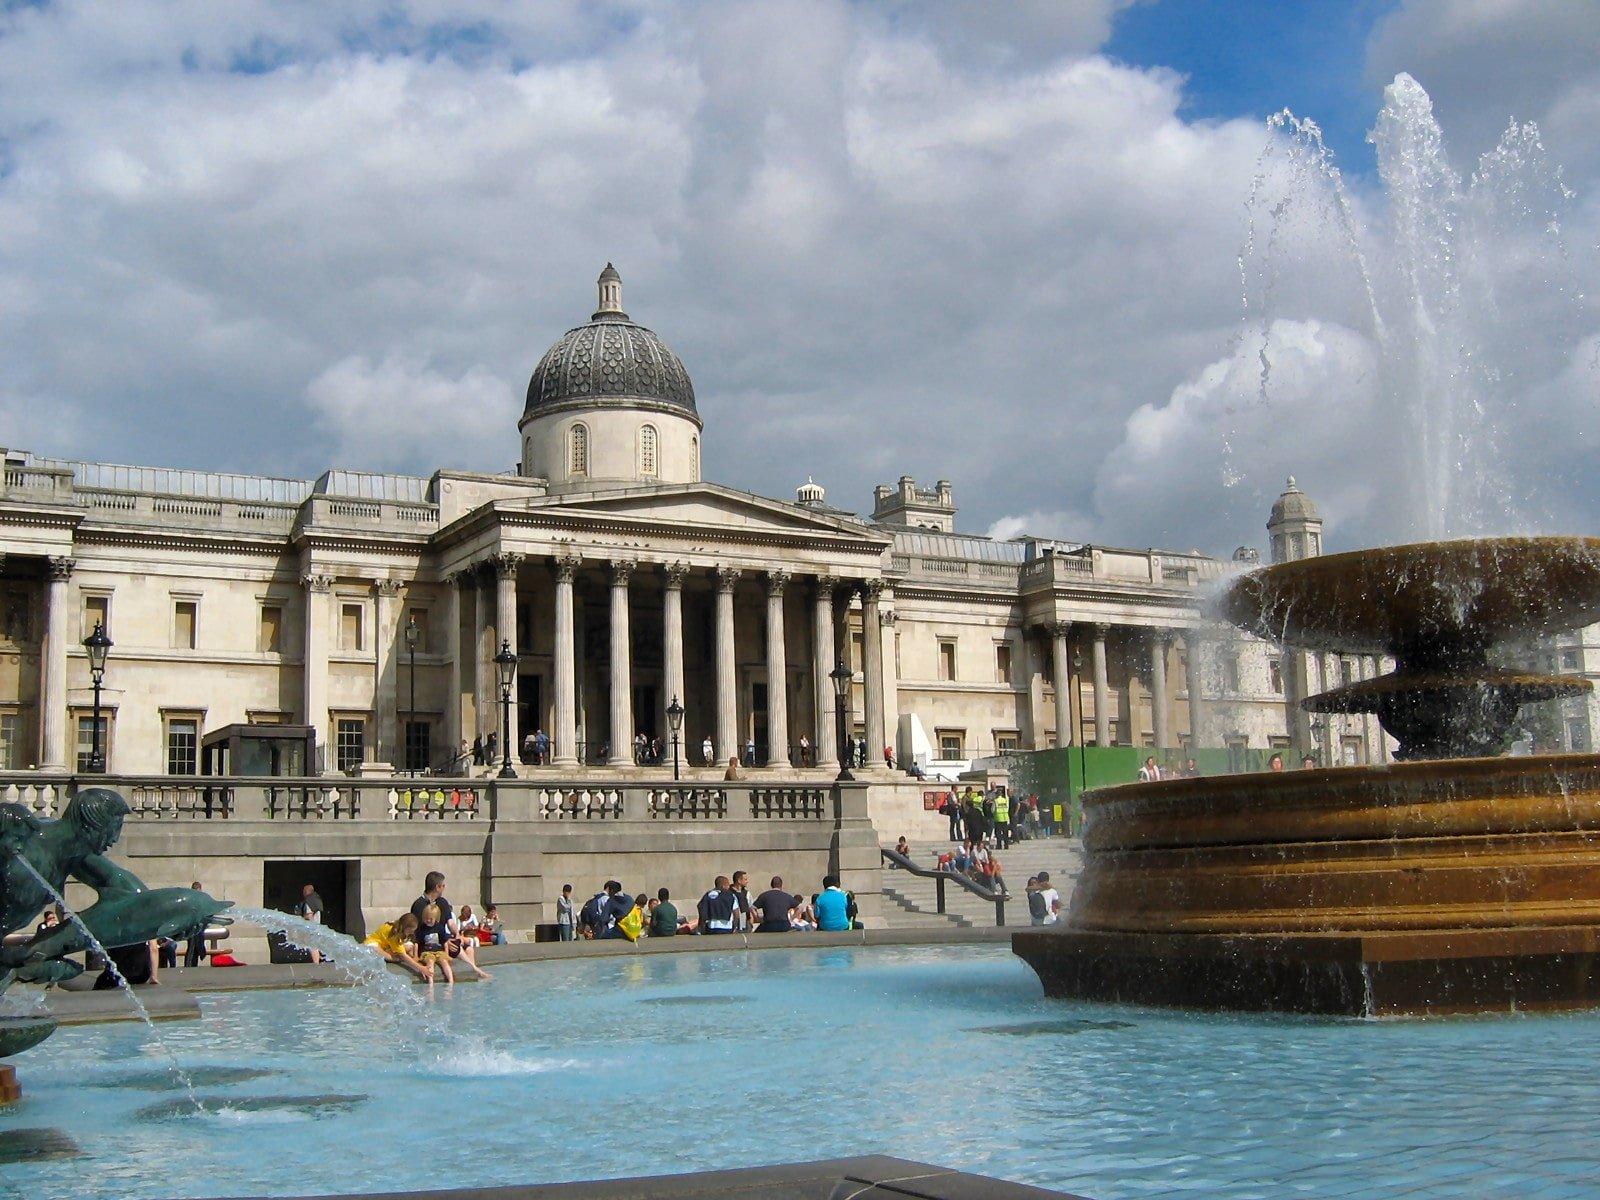 National gallery (Національна галерея), визначні місця Лондона